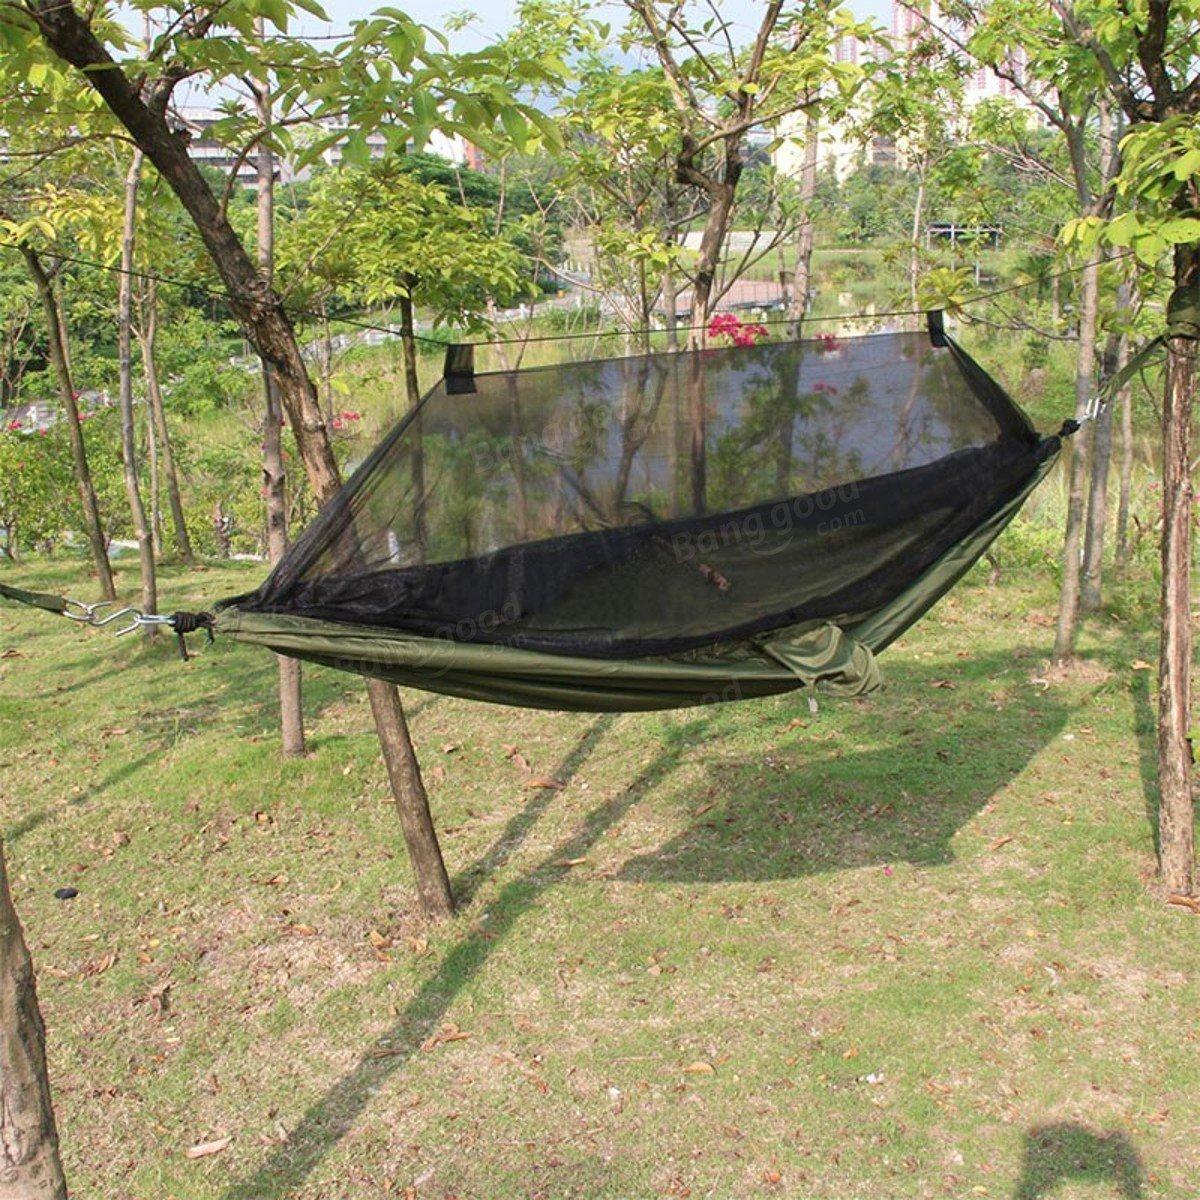 Tenting Hummock - Outdoor Portable Camping Hammock Swing Hanging Sleeping Bed Mosquito Net - Encampment Hillock Bivouacking - 1PCs